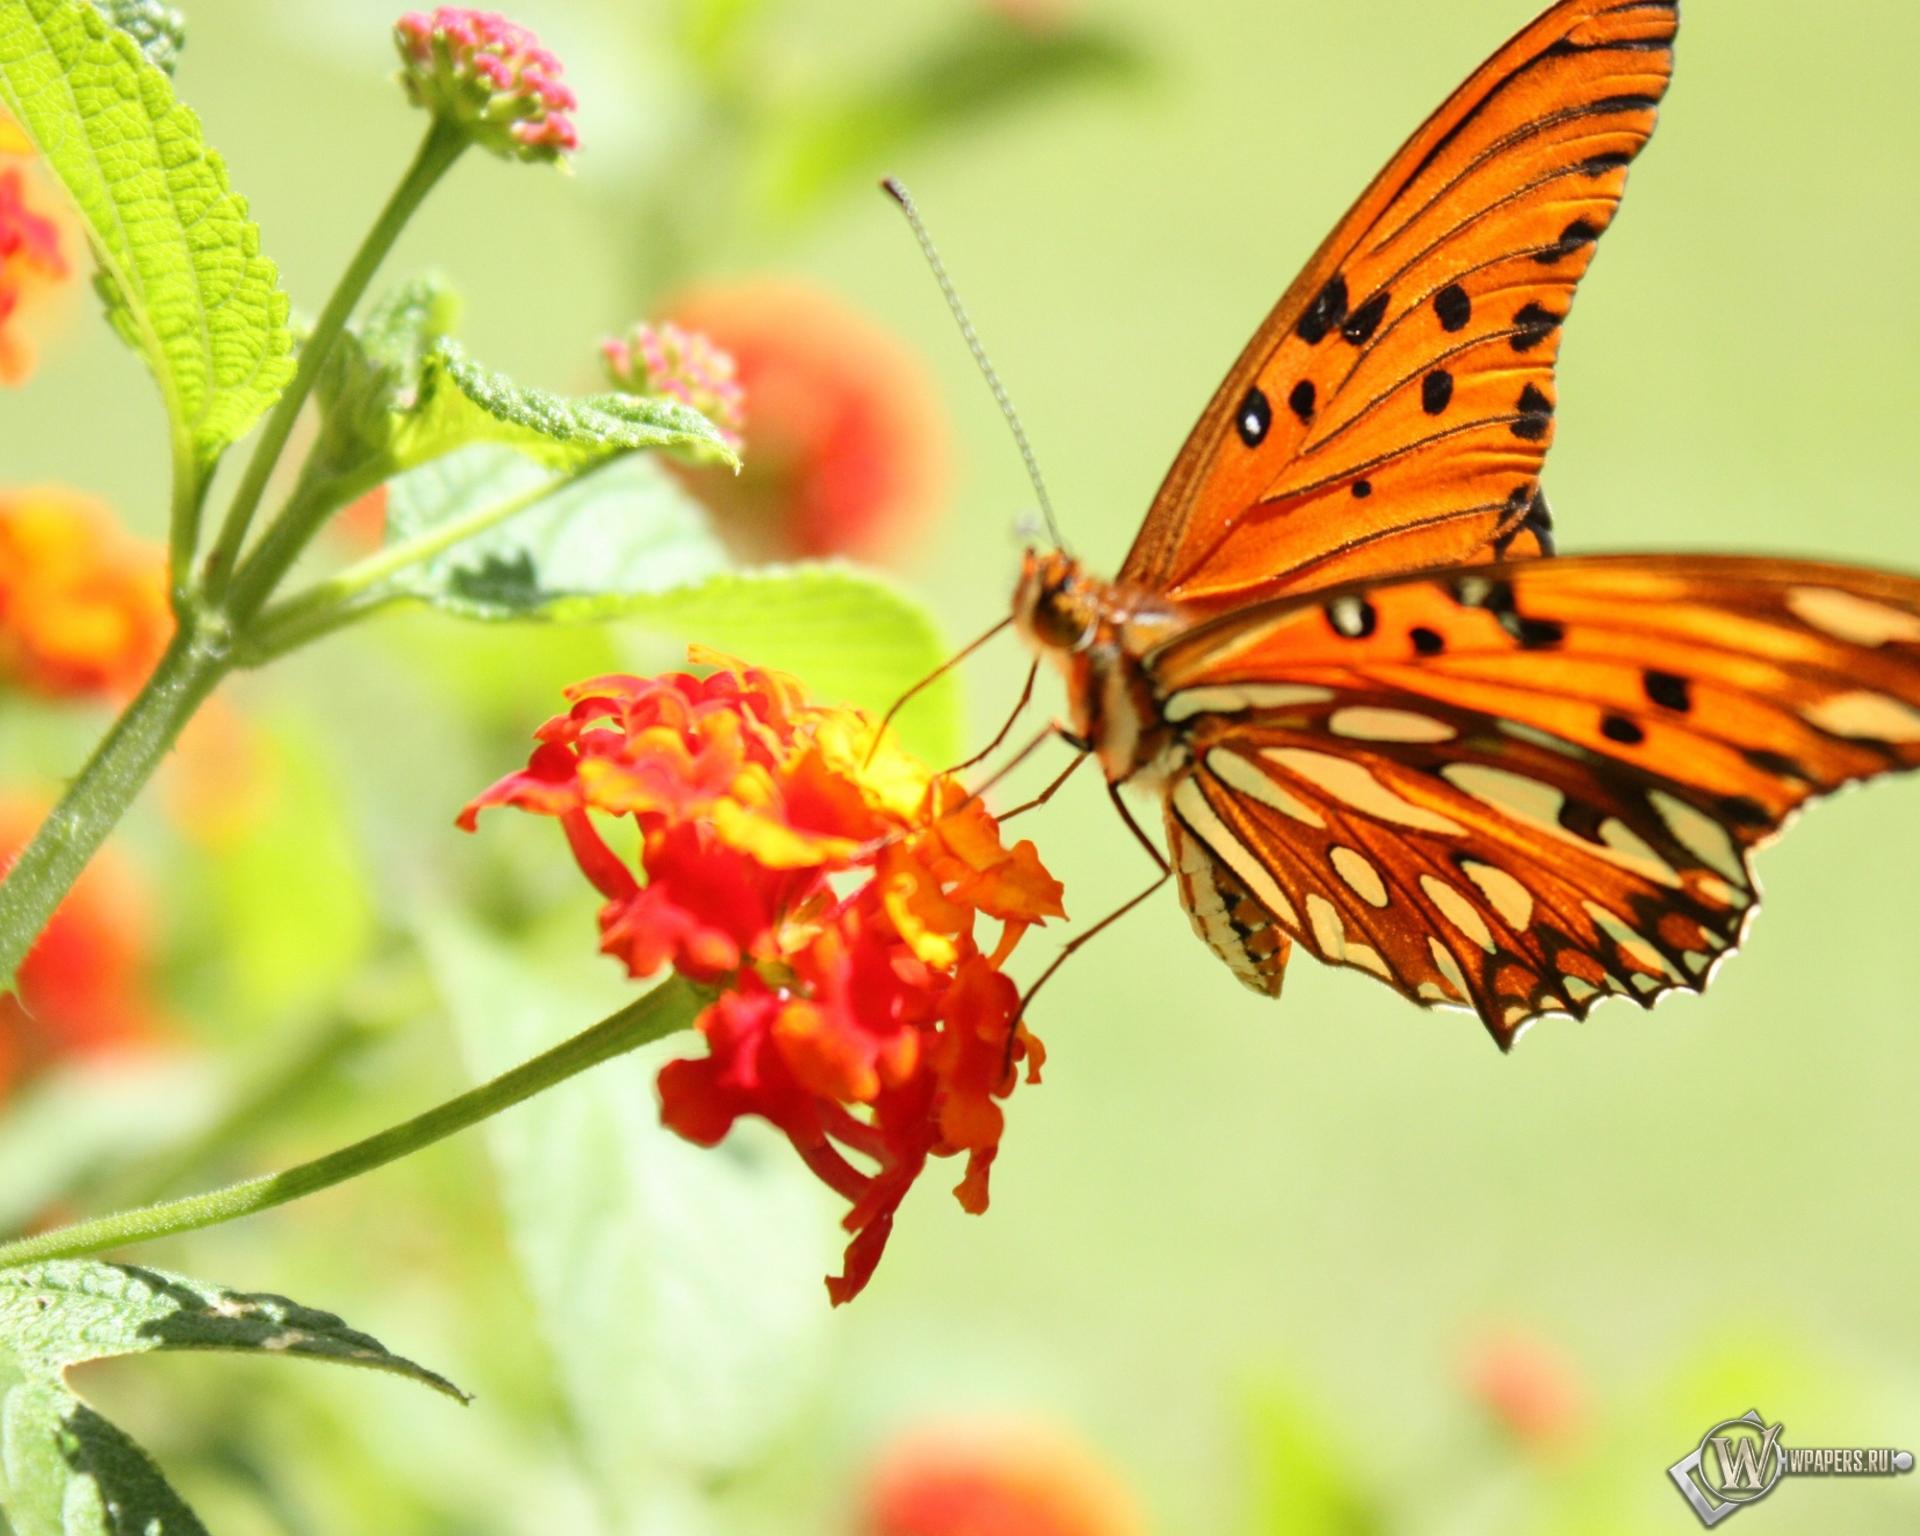 Бабочка на цветке 1920x1536